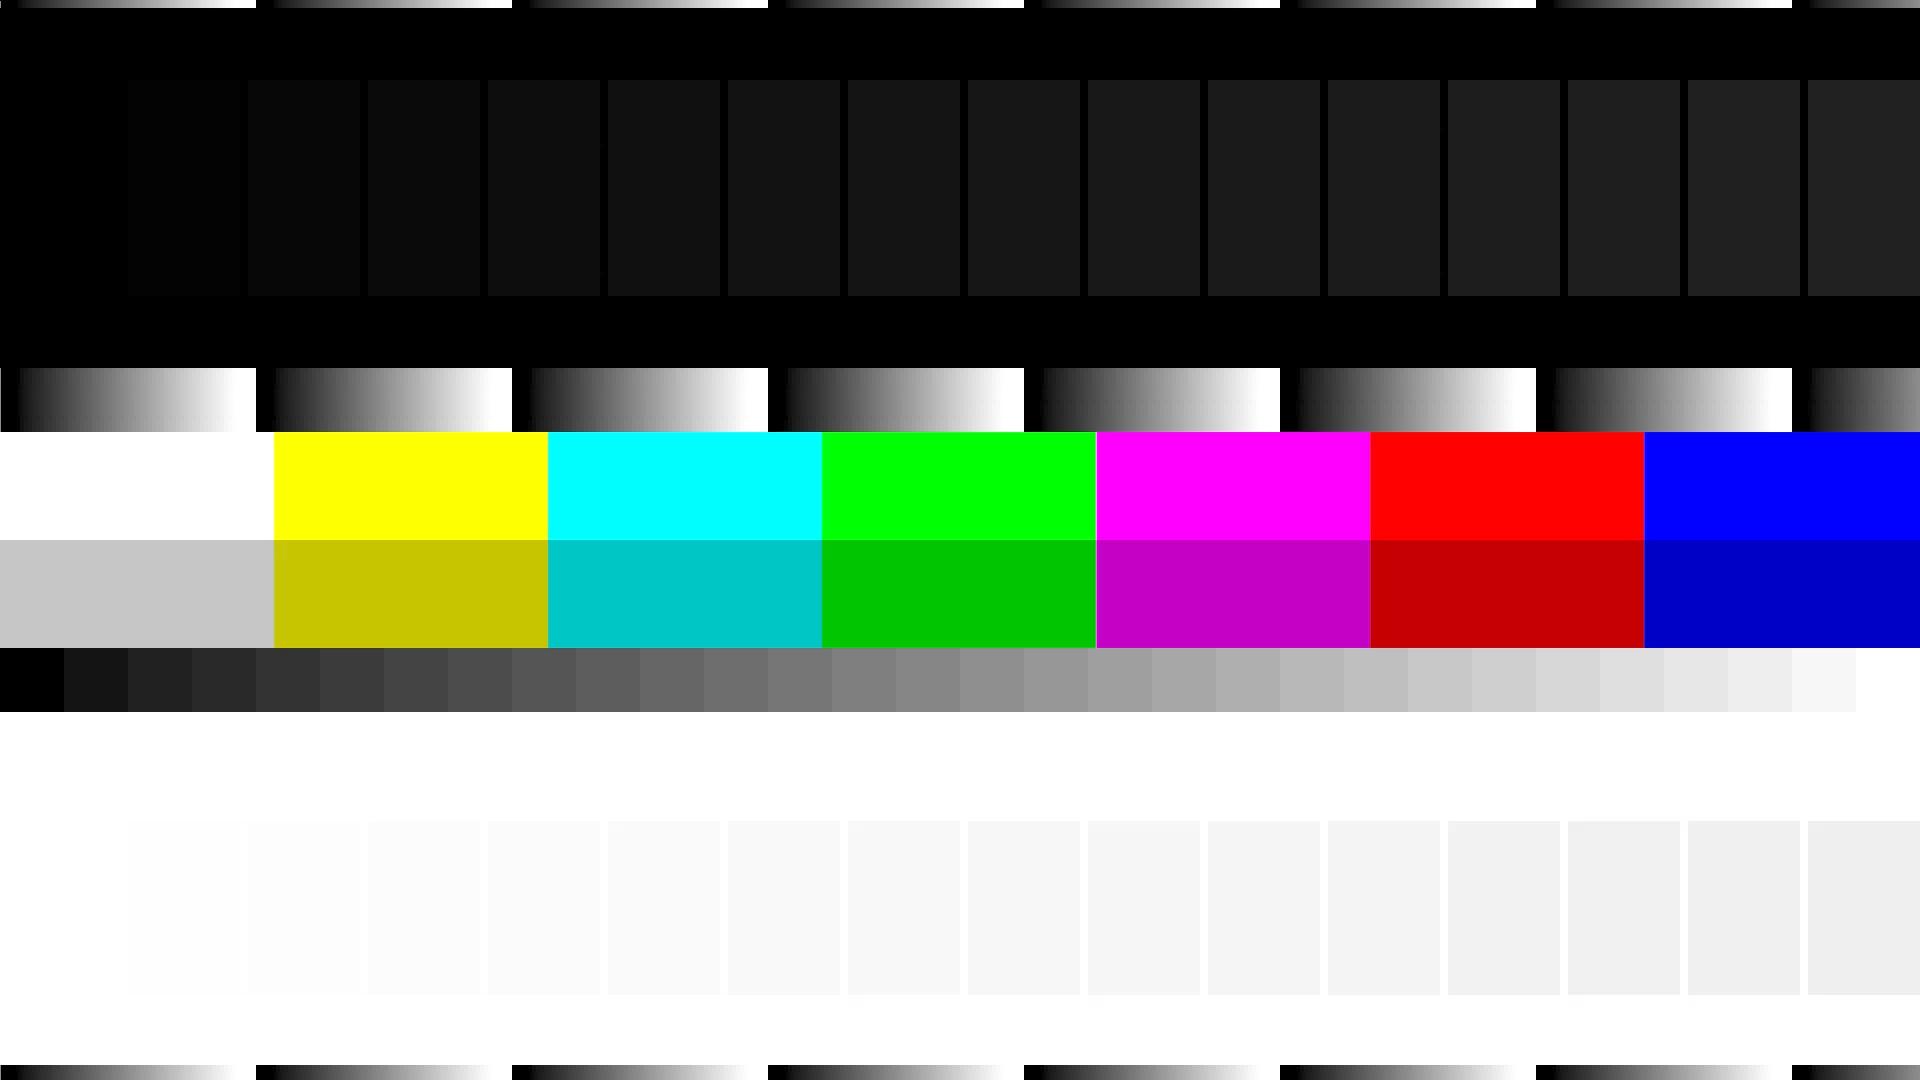 ios_decode_bt709_gamma